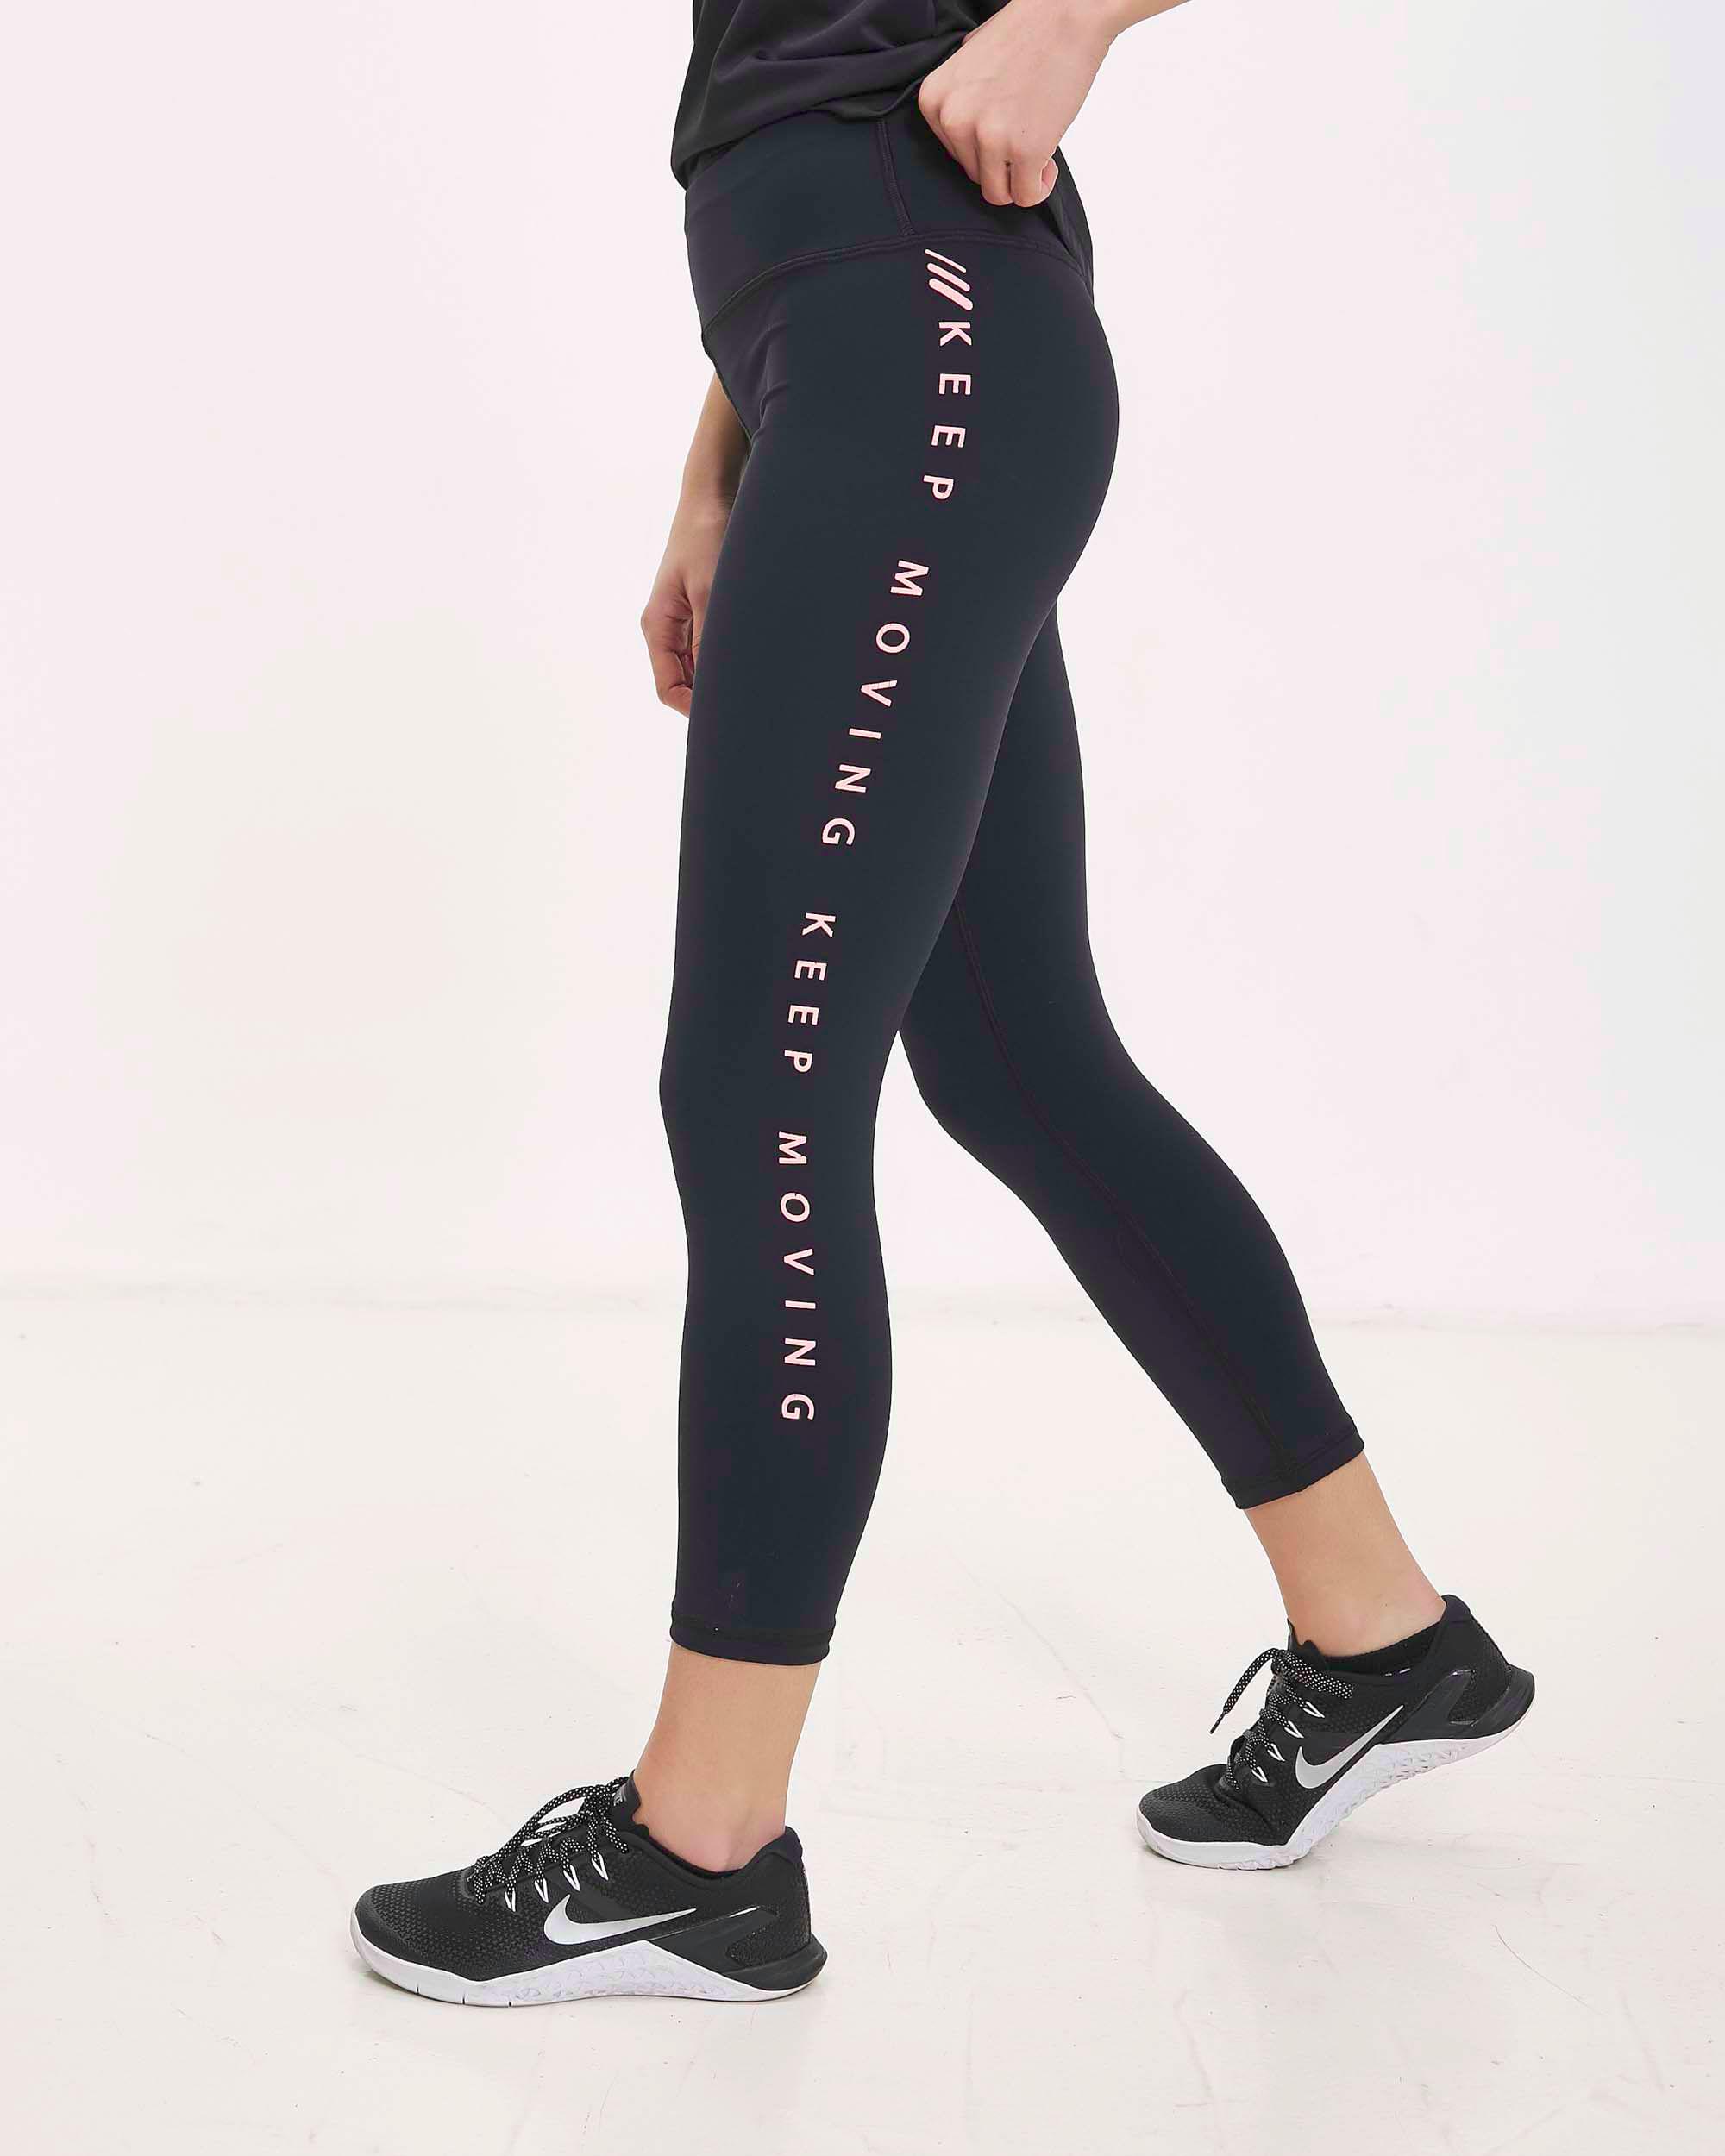 calza-deportiva-de-mujer